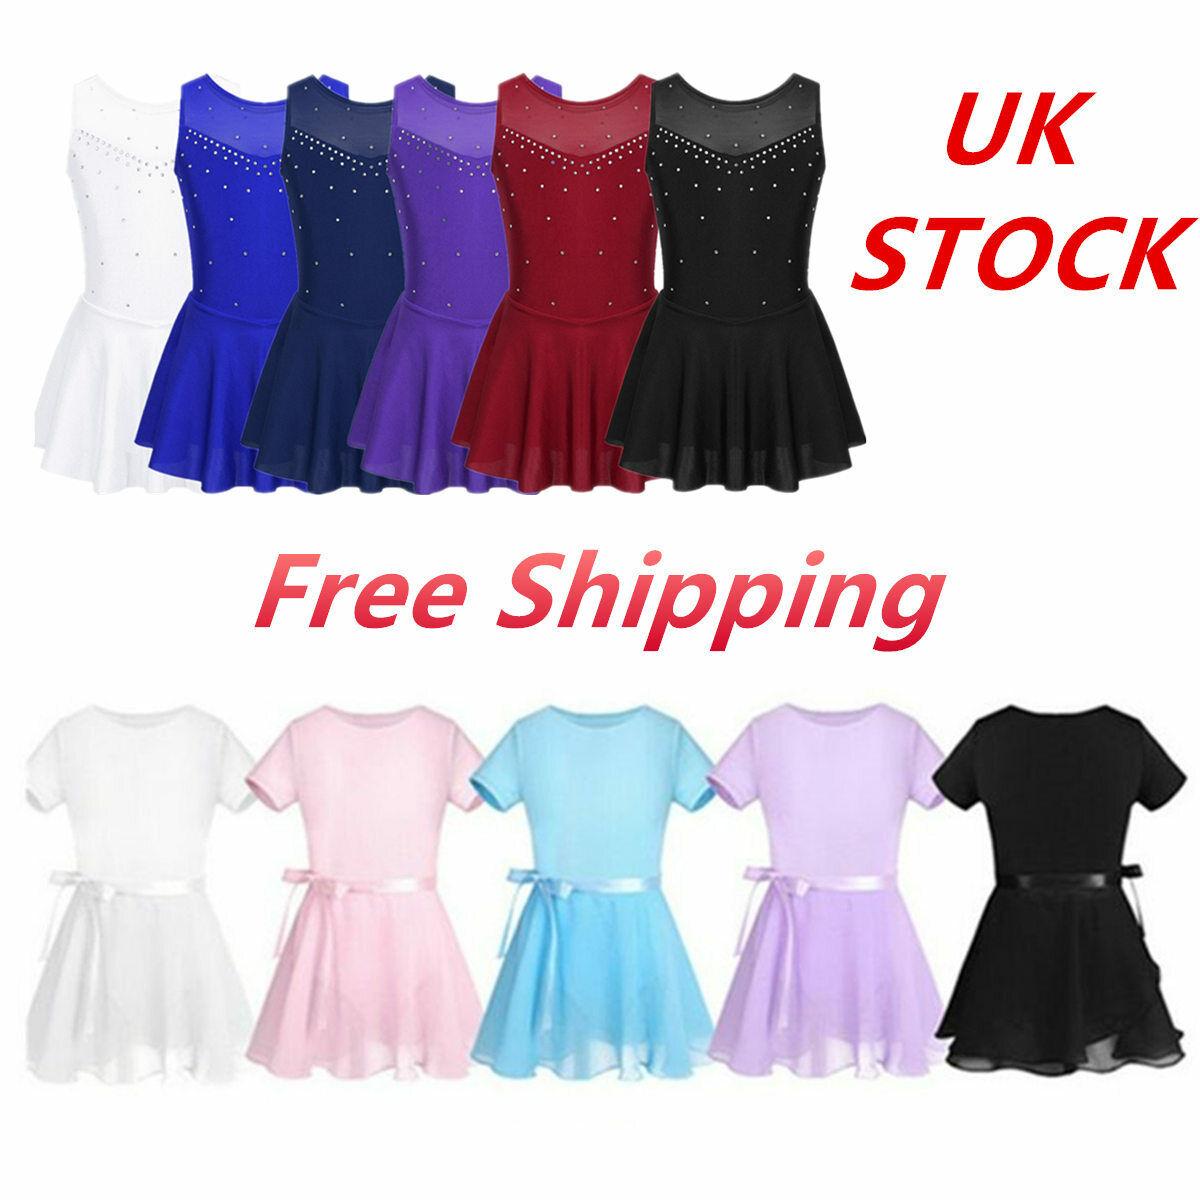 UK Girls Ballet Dress Ice Skating Gymnastic 2Pcs Leotard Lyrical Dancewear Skirt